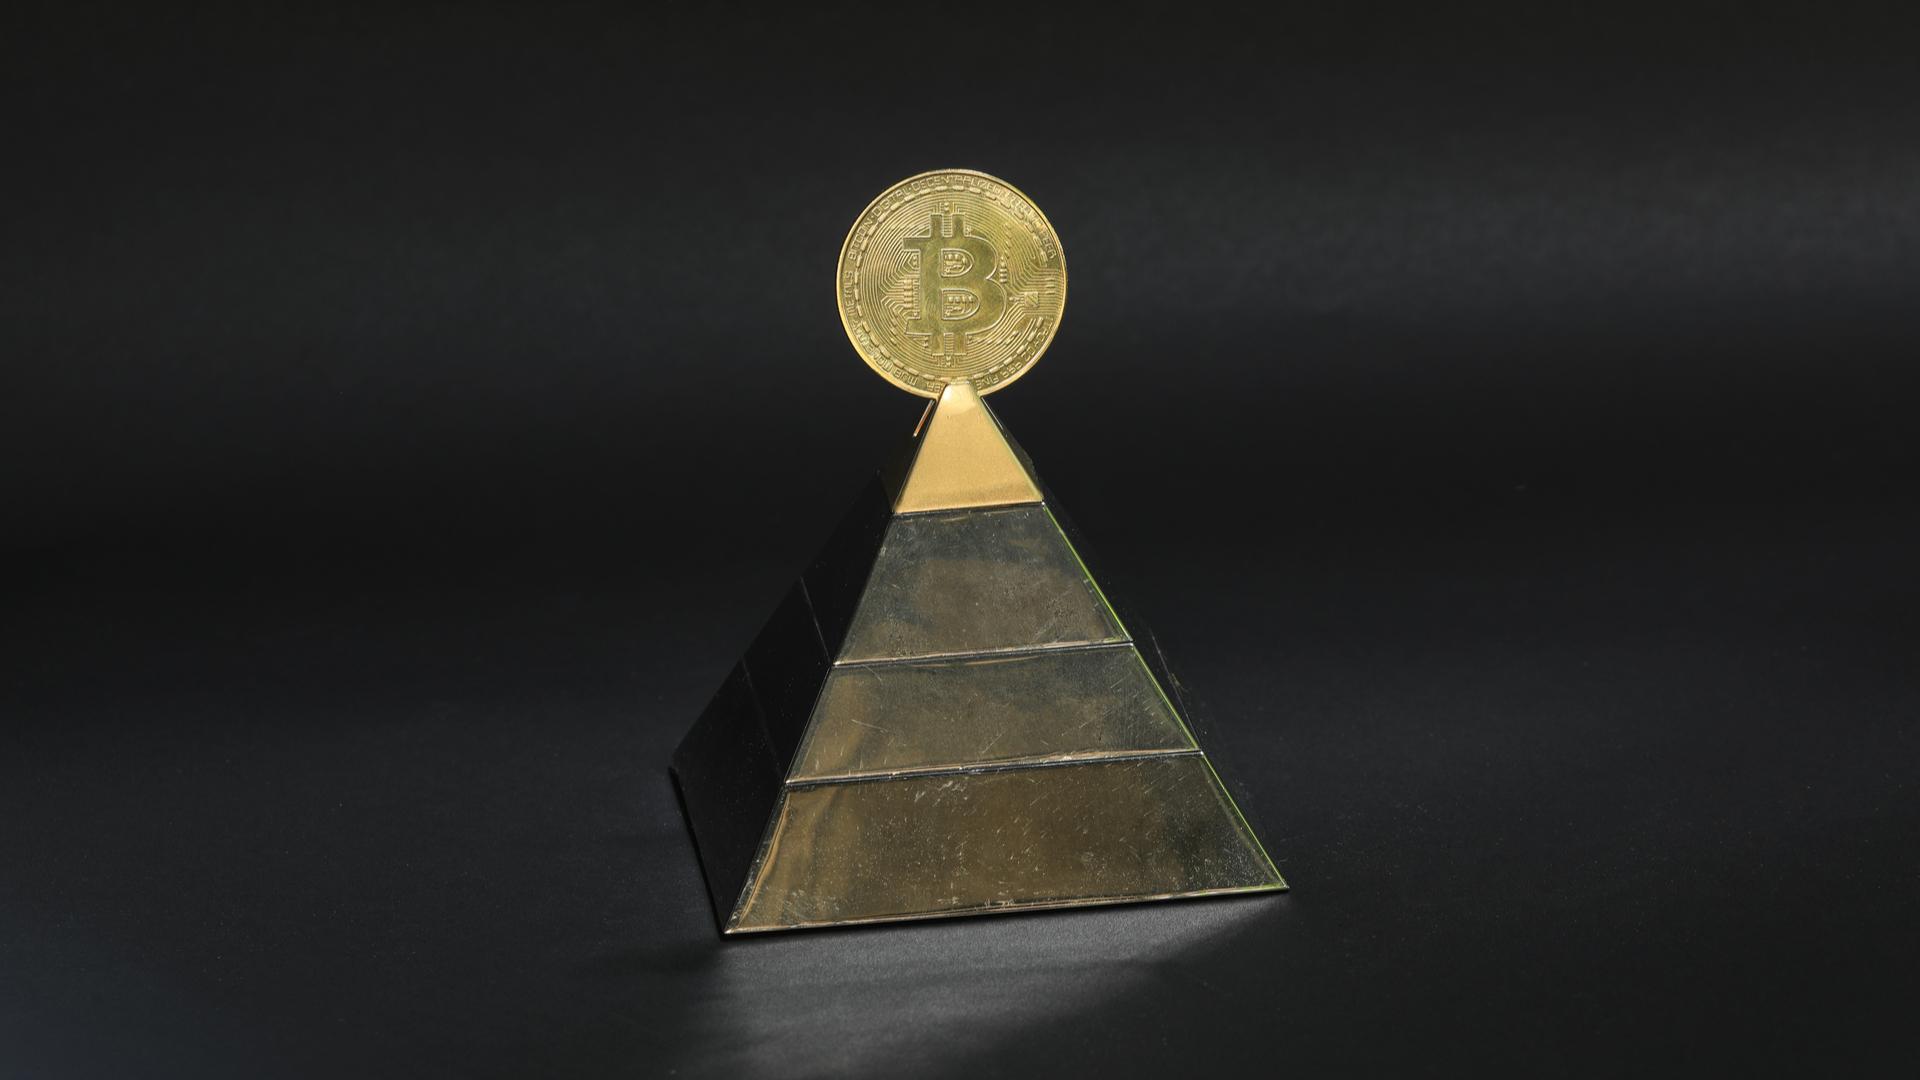 MPF investiga suspeito de pirâmide financeira de Bitcoin que fugiu para Dubai